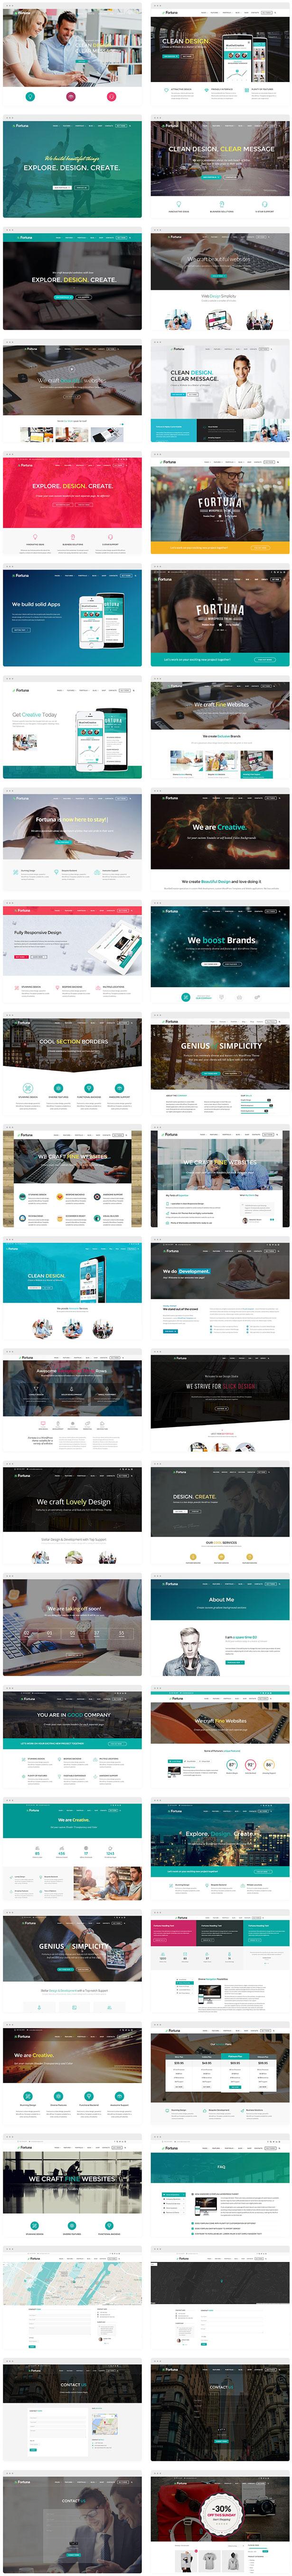 Fortuna - Responsive Multi-Purpose WordPress Theme - 14